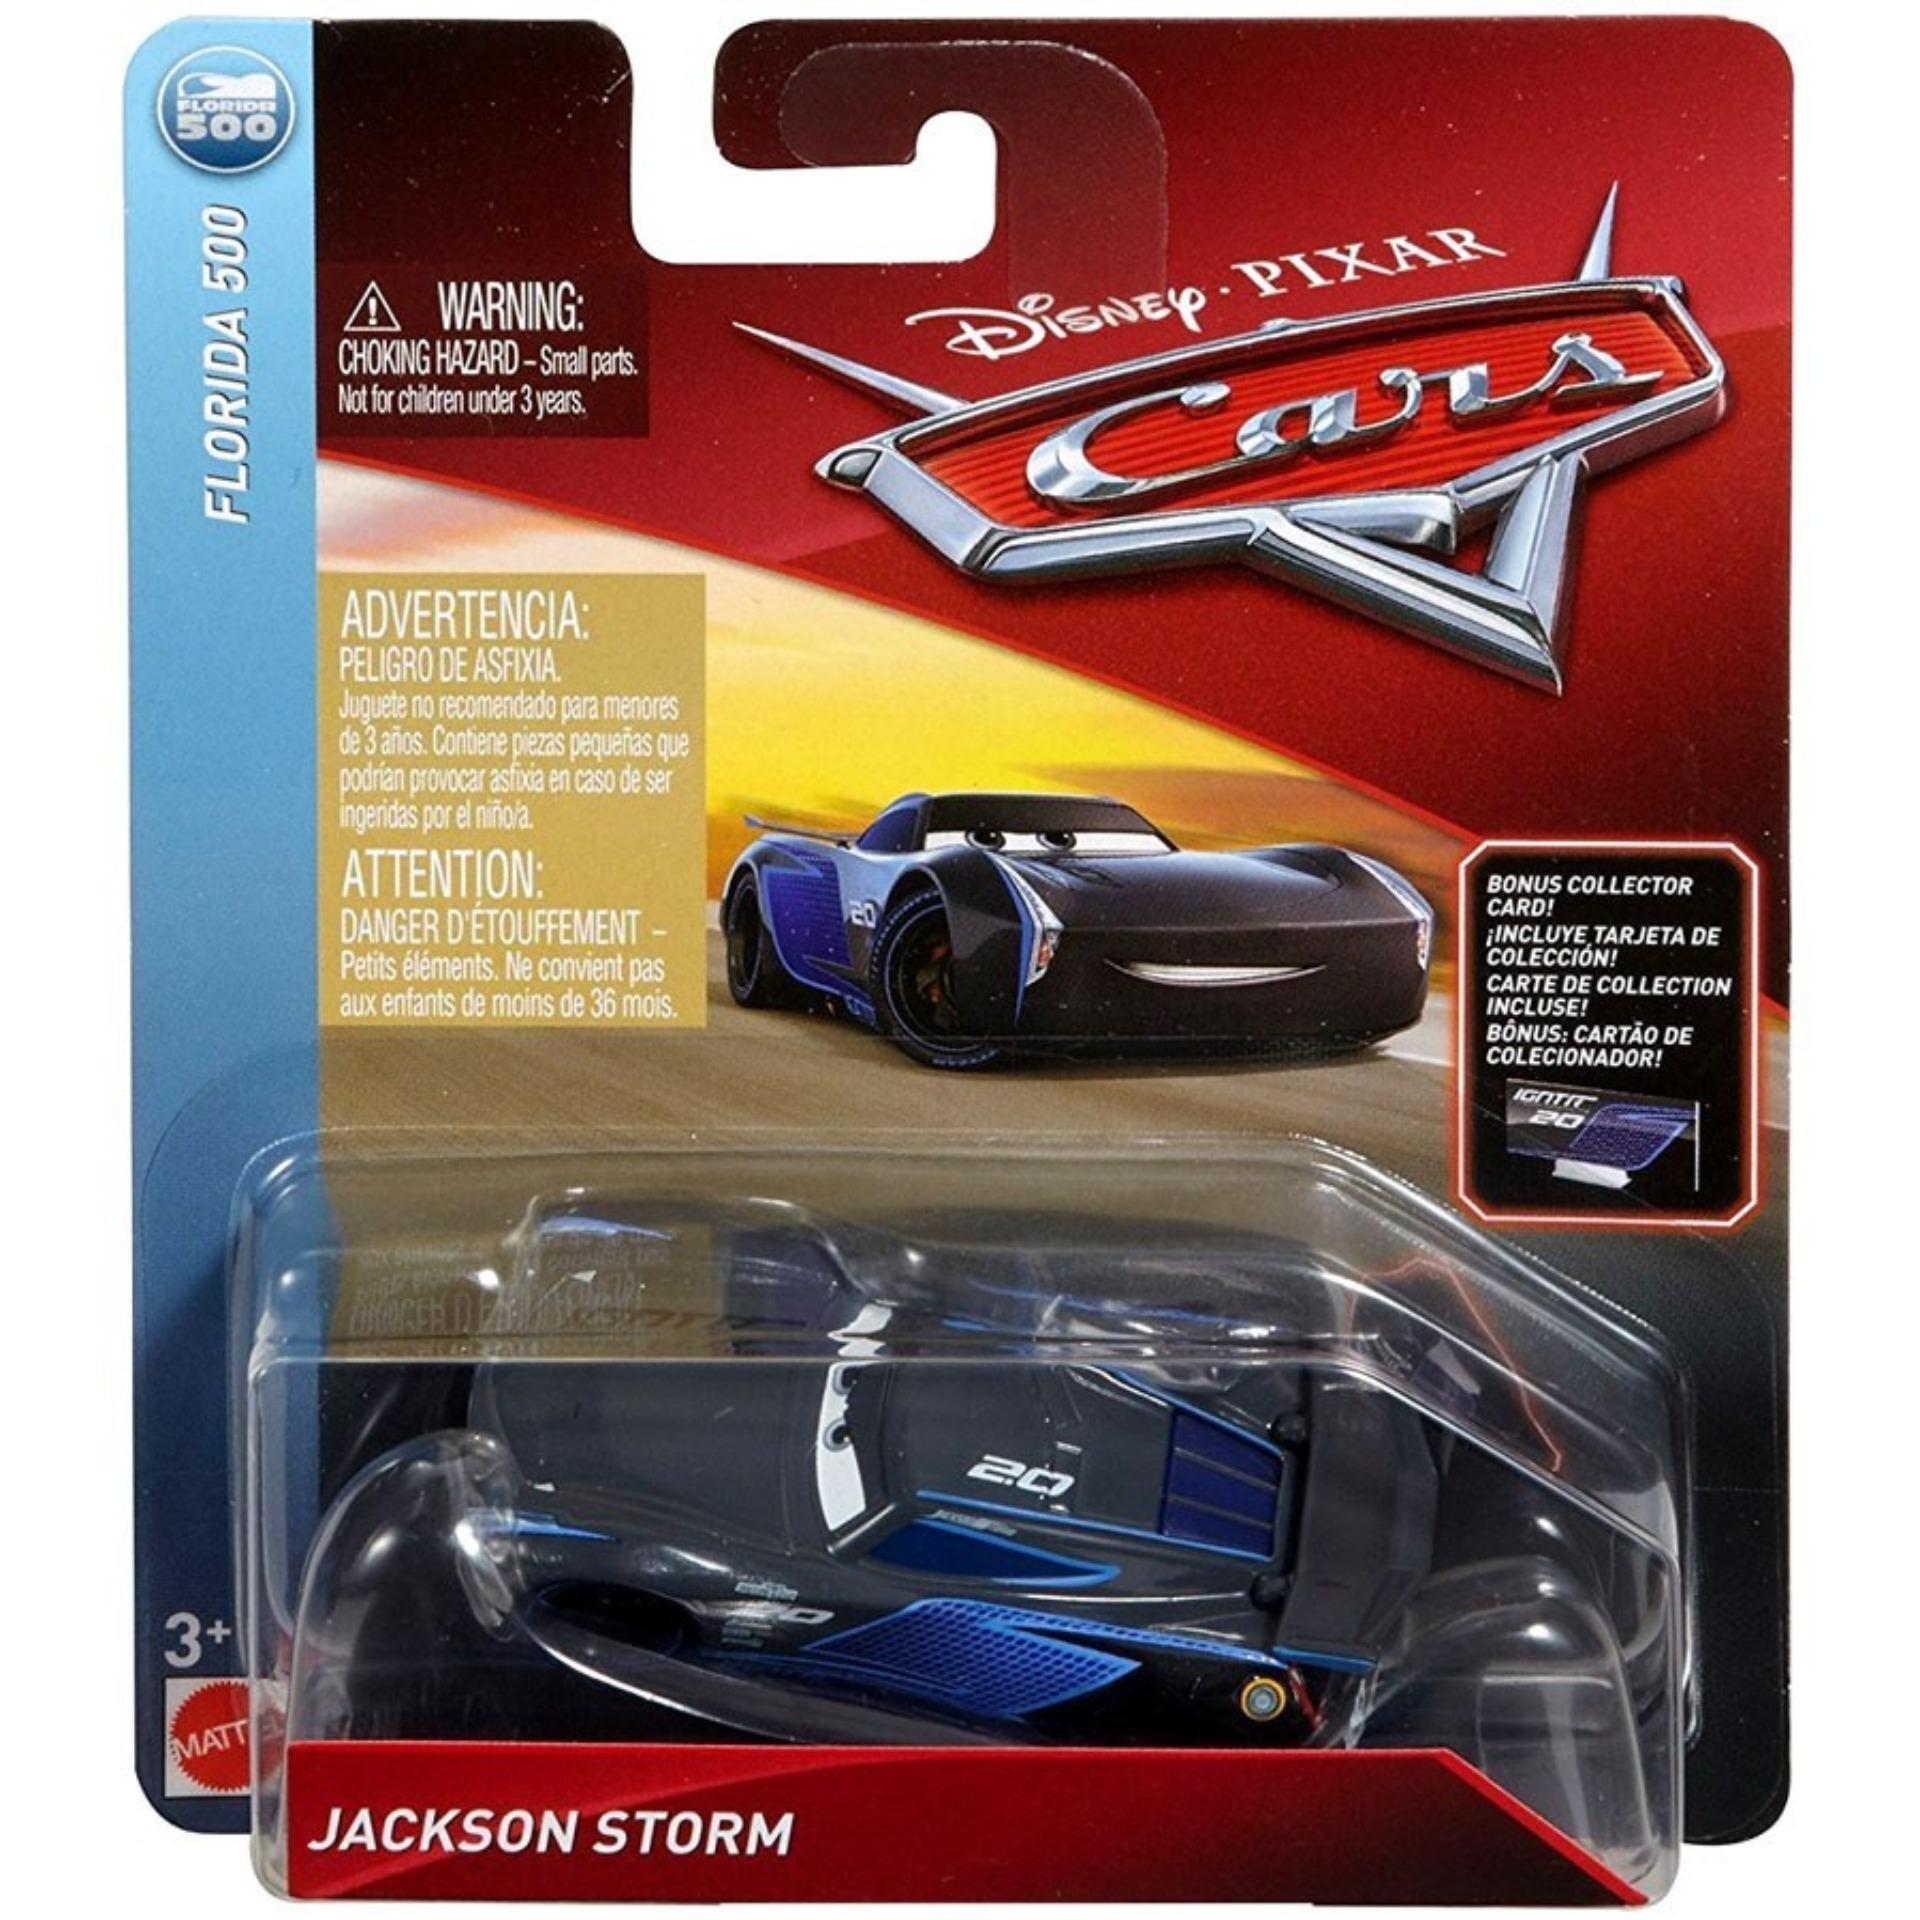 ef2faa537be6 Disney Cars 3 Die Cast Vehicle - Jackson Storm (Florida 500)